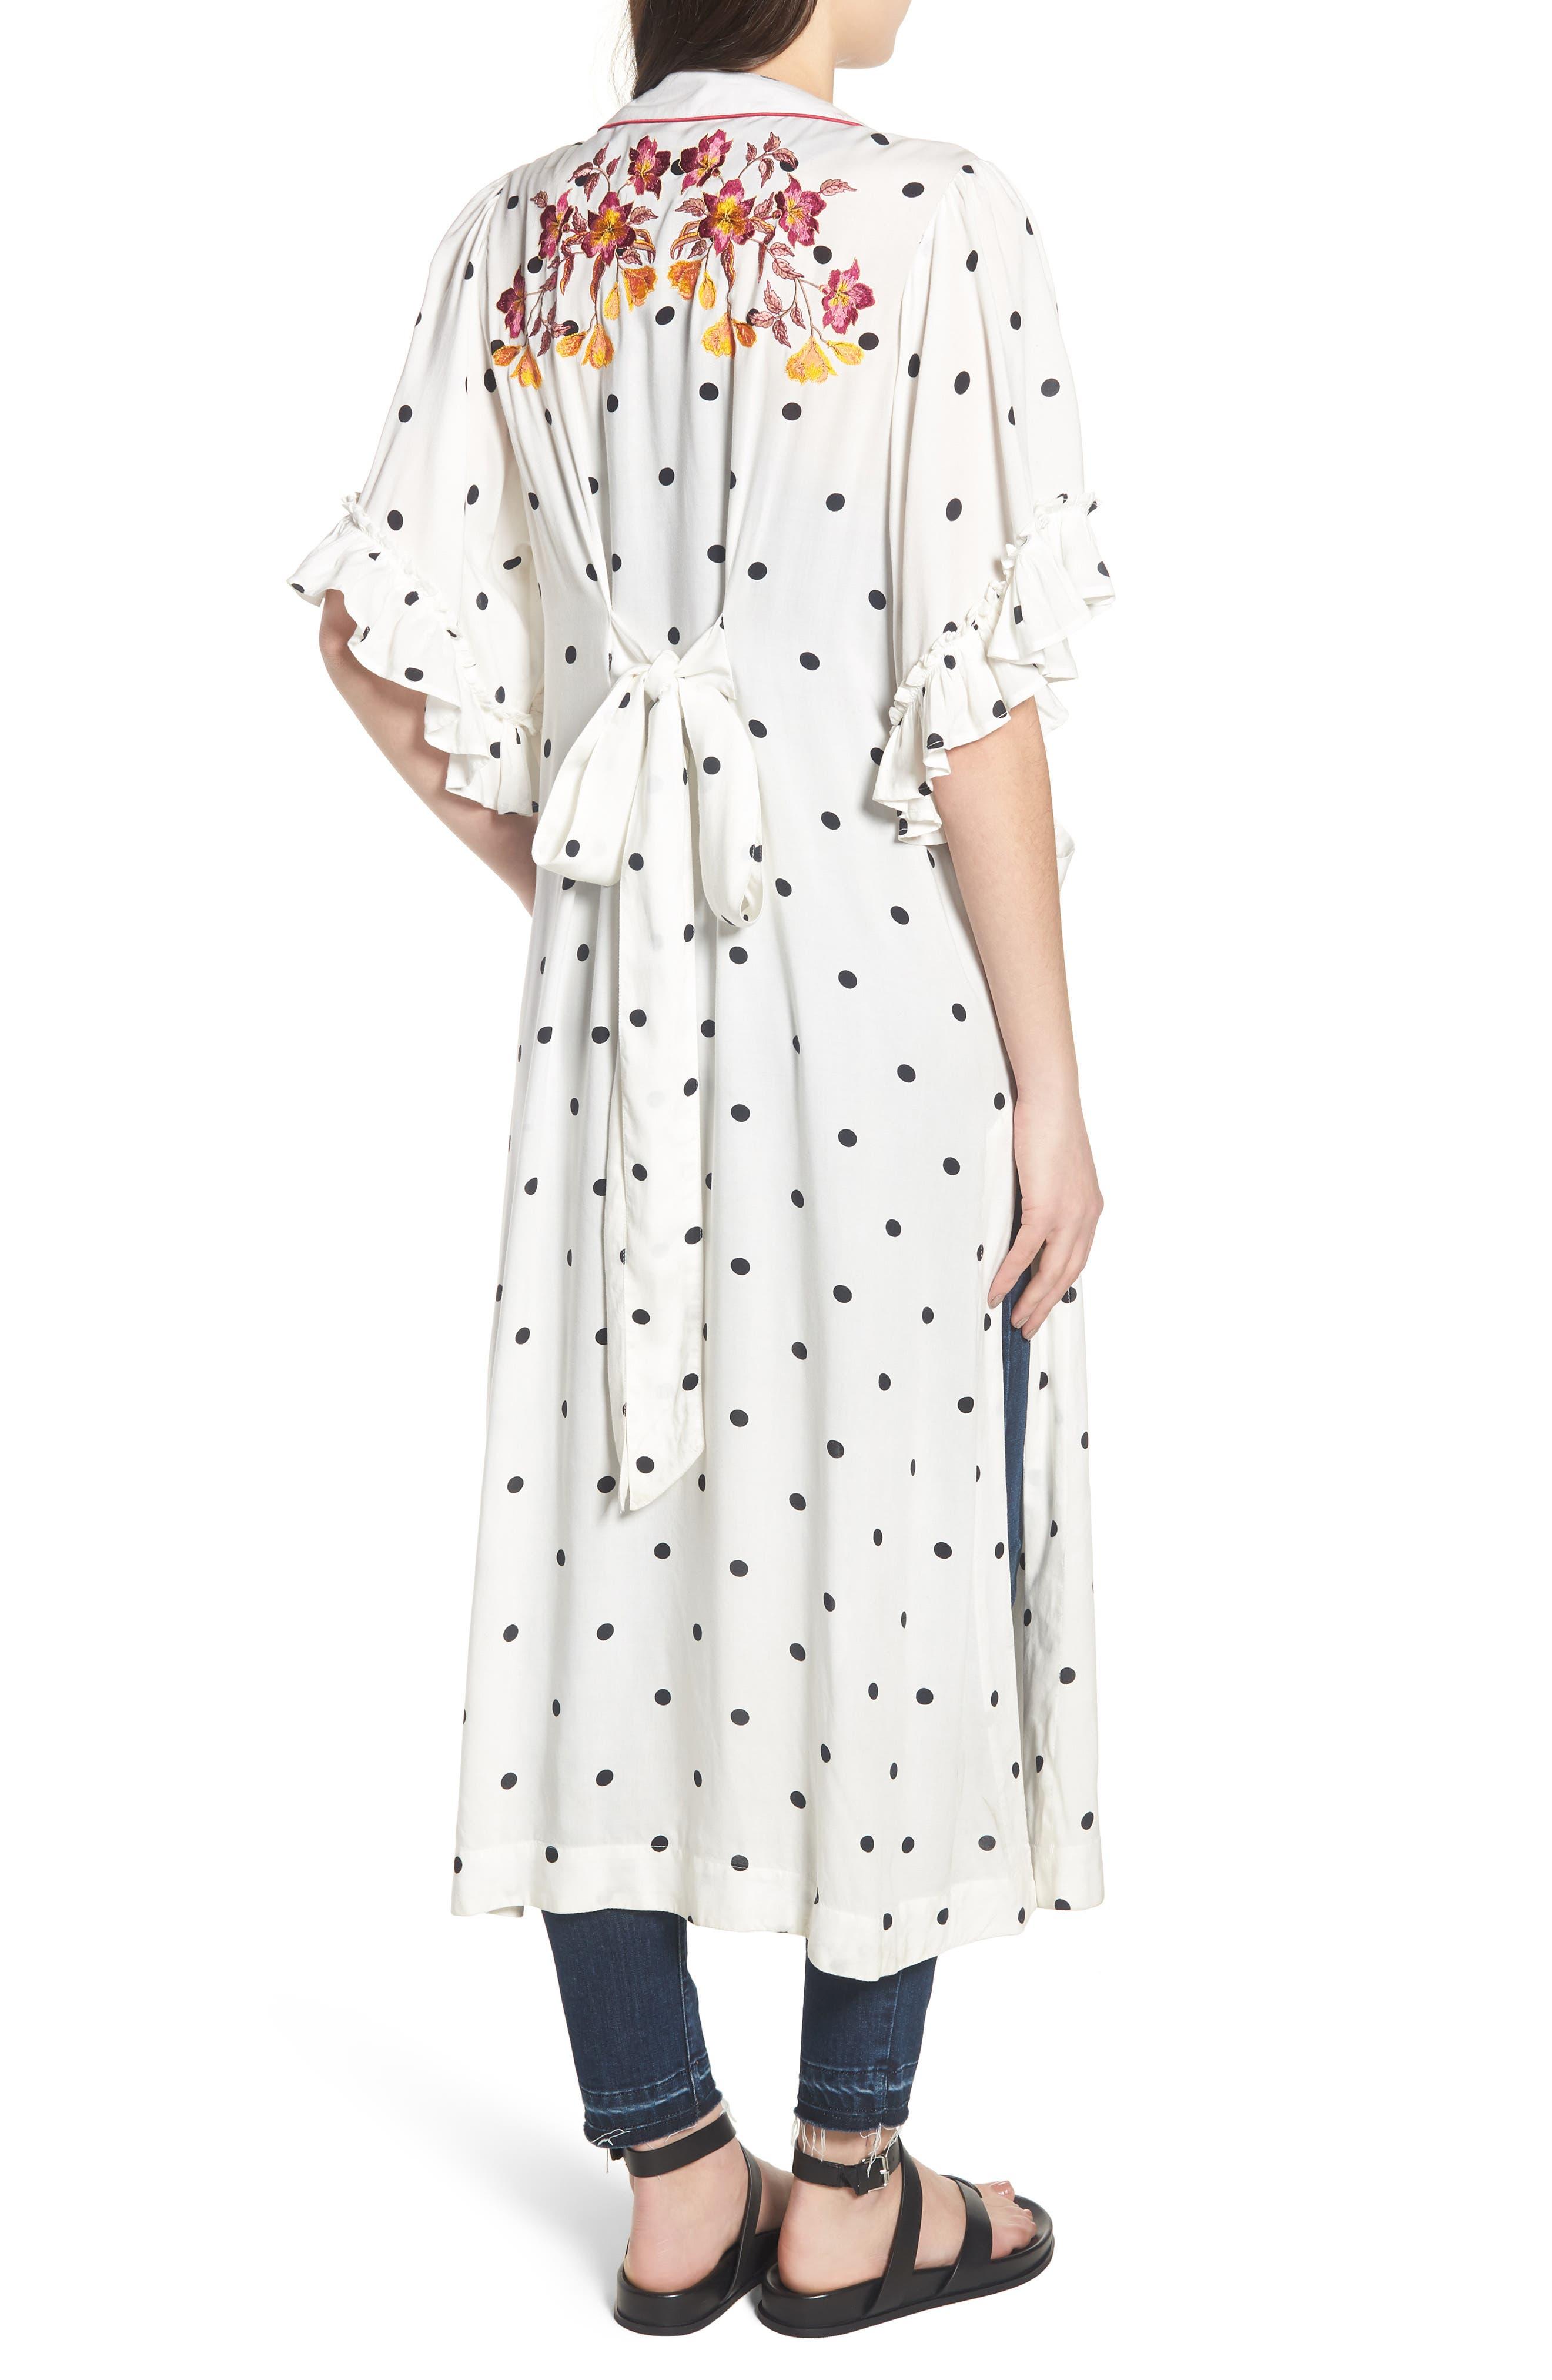 Hot Spot Kimono,                             Alternate thumbnail 2, color,                             Black/ White Polka Dot Print